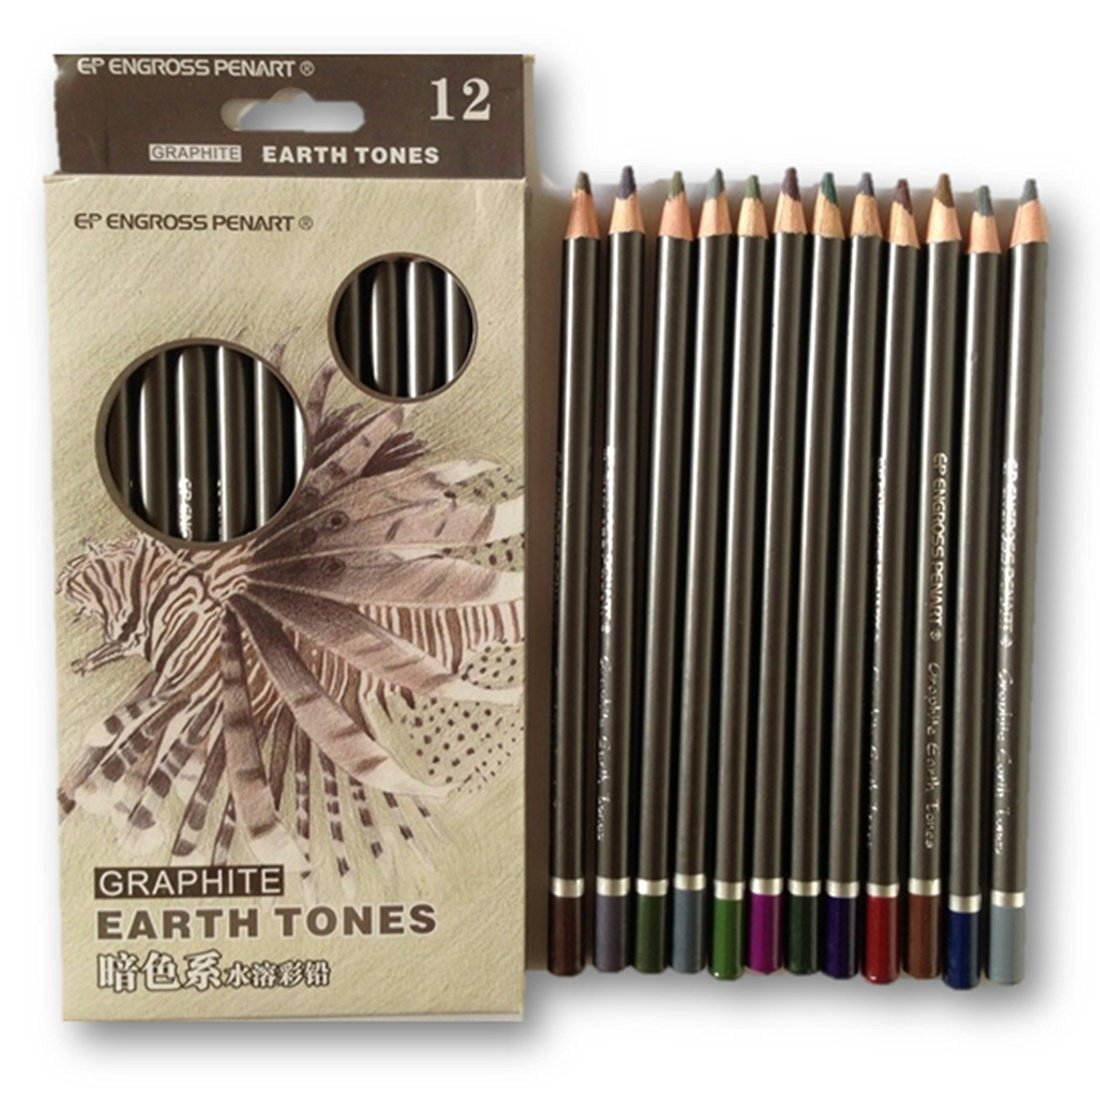 LightningStore Peroci Black Wood Graphite Earth Tone Professional Soluble Watercolor Colored Pencils- Colored Pencils 12 -Colored Pencils 12 Count- Colored Pencils in Bulk- Colored Pencils Classpack